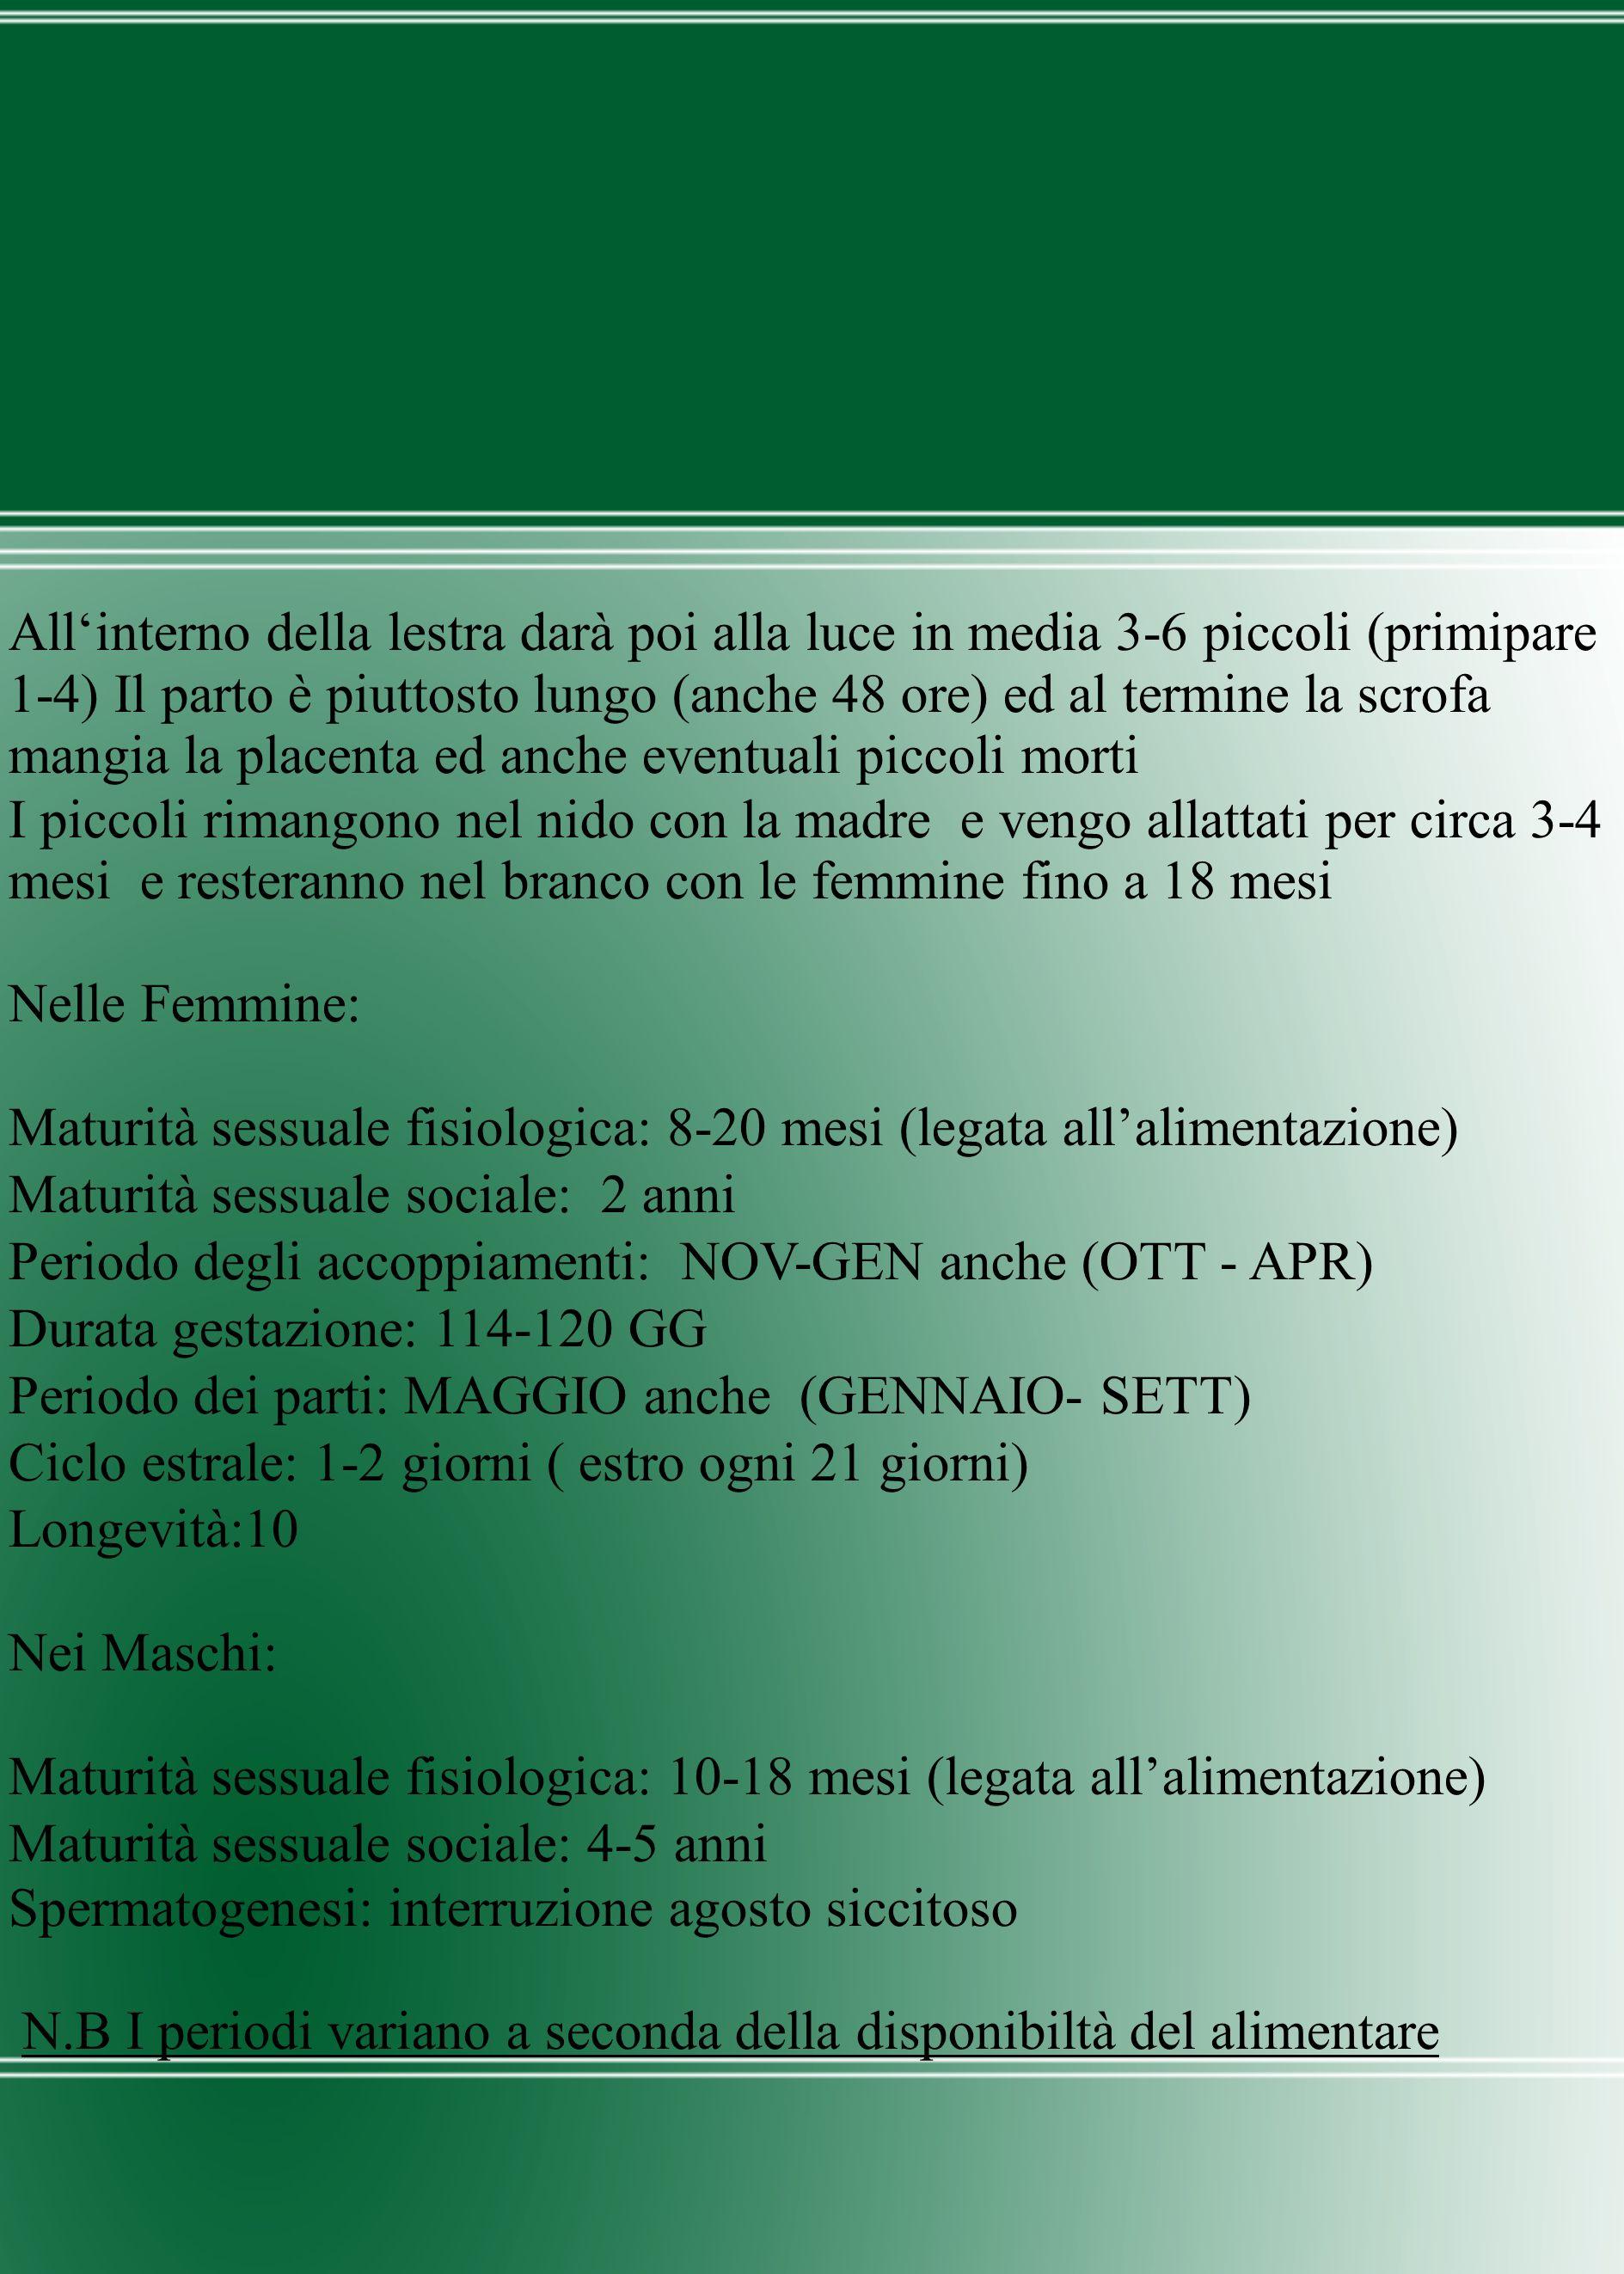 Maturità sessuale fisiologica: 8-20 mesi (legata all'alimentazione)